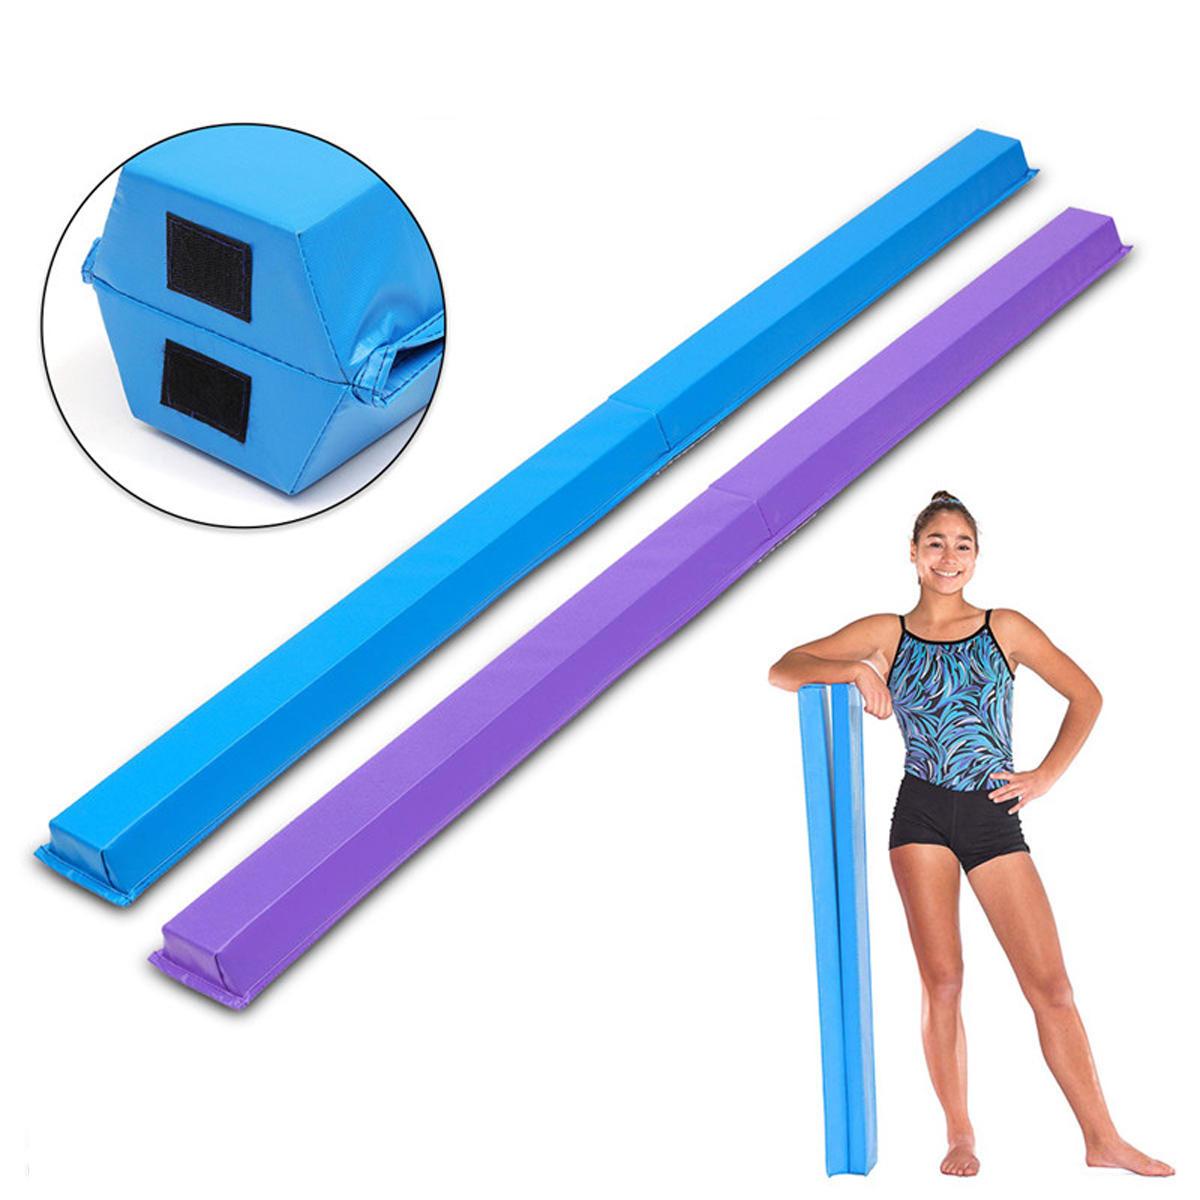 94.48x3.93x2.75inch Gymnastics Folding Balance Beam Horizontal Skill Performance Training Exercise Tools Airtrack